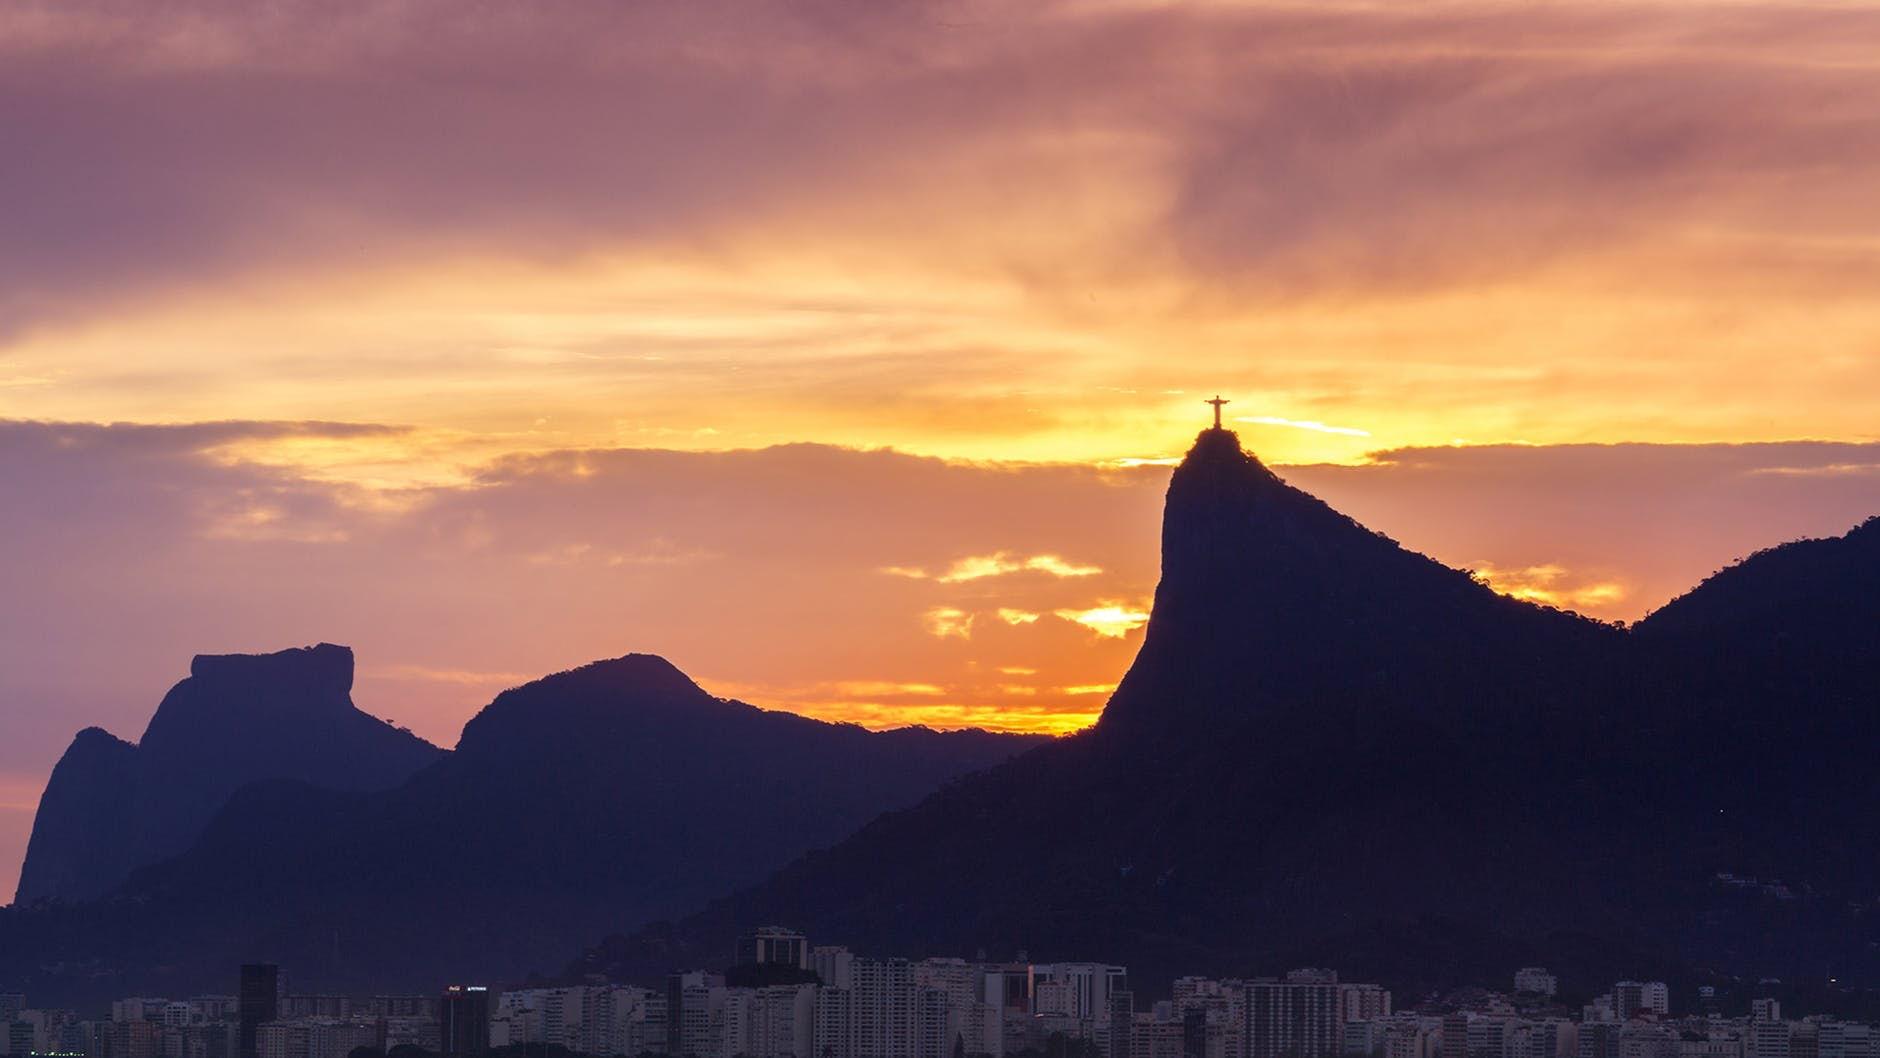 Enjoy your vacation in Rio!